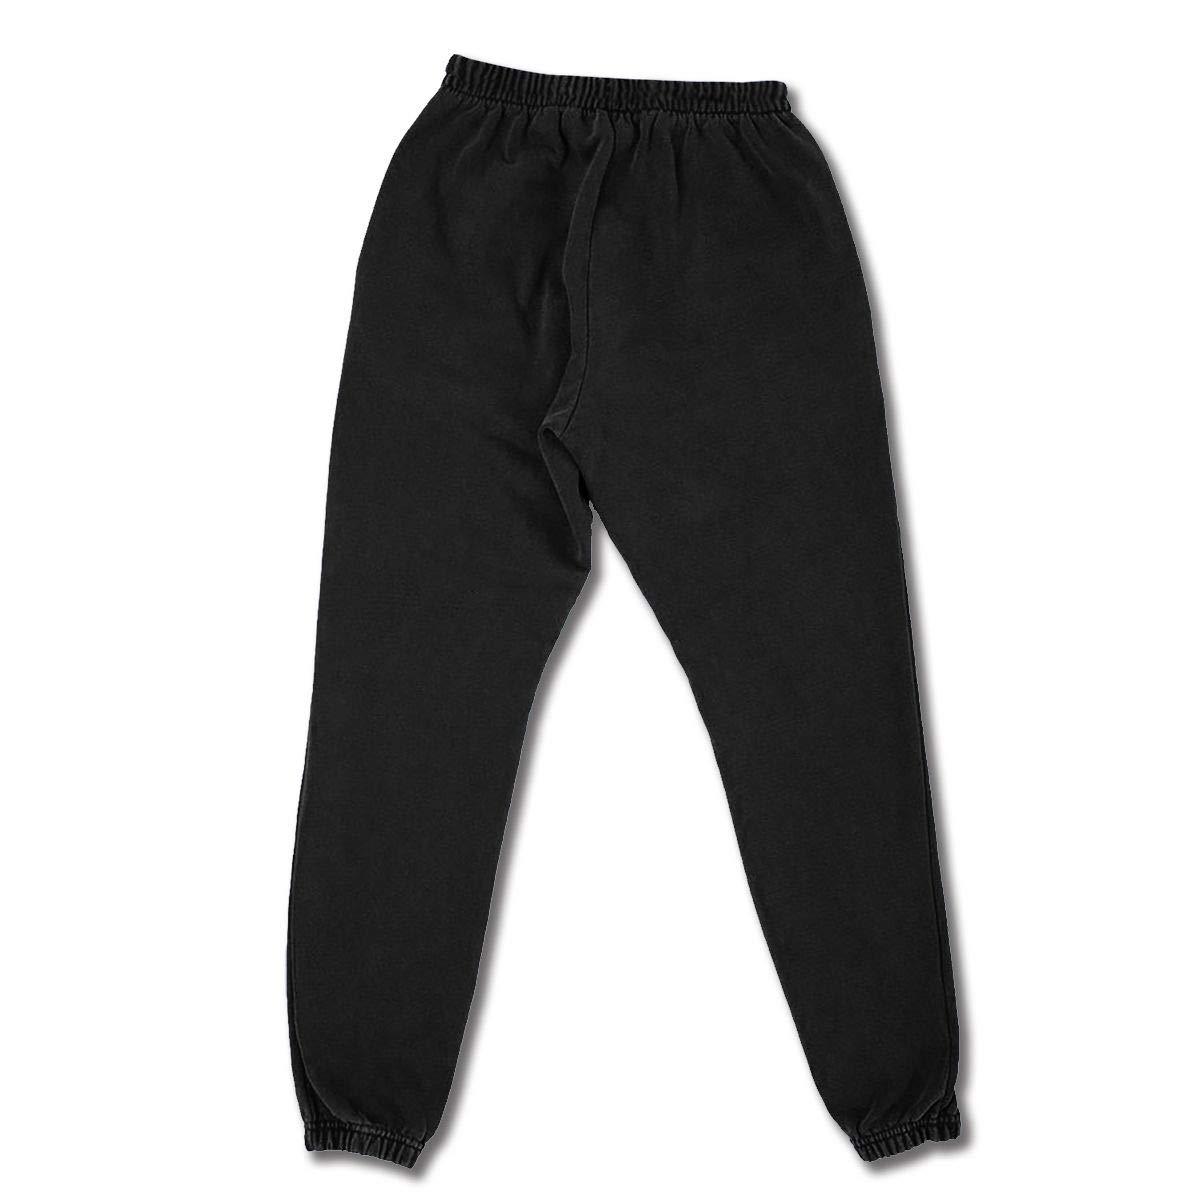 Cyloten Cow Print Sweatpants Mens Breathable Baggy Trousers Durable Jogging Pants